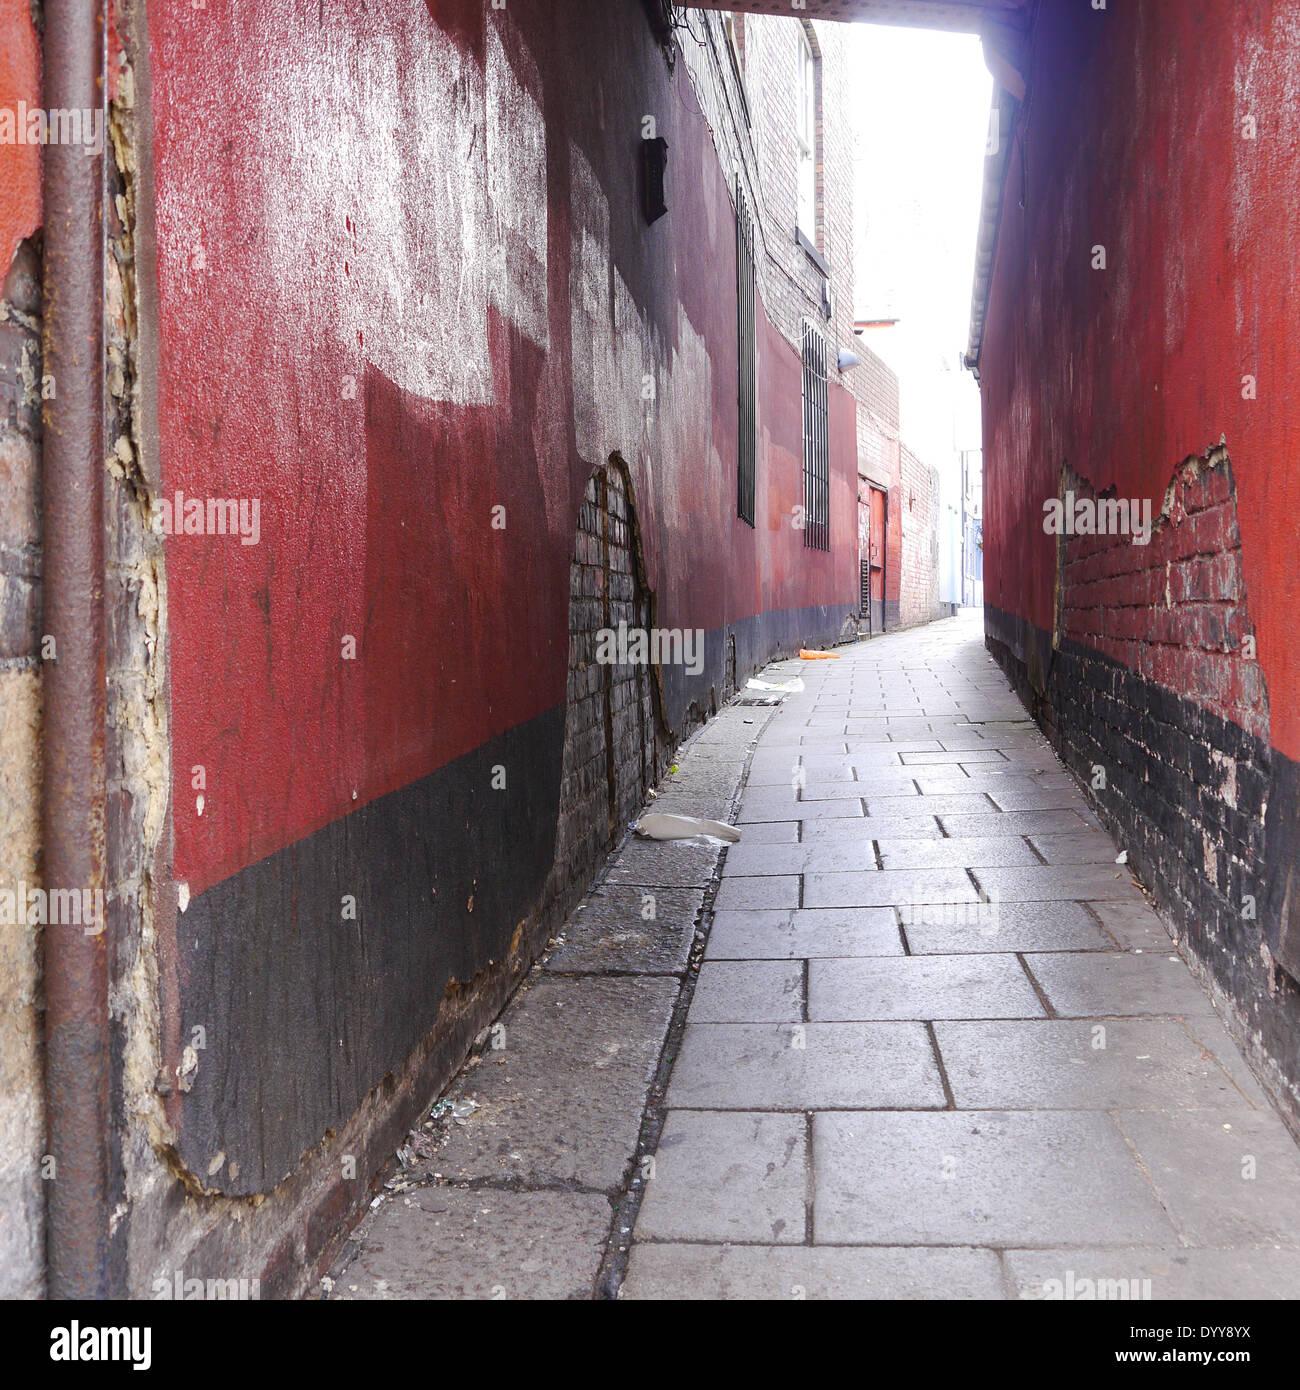 Abandoned Buildings Newcastle Uk: Derelict Lane Stock Photos & Derelict Lane Stock Images